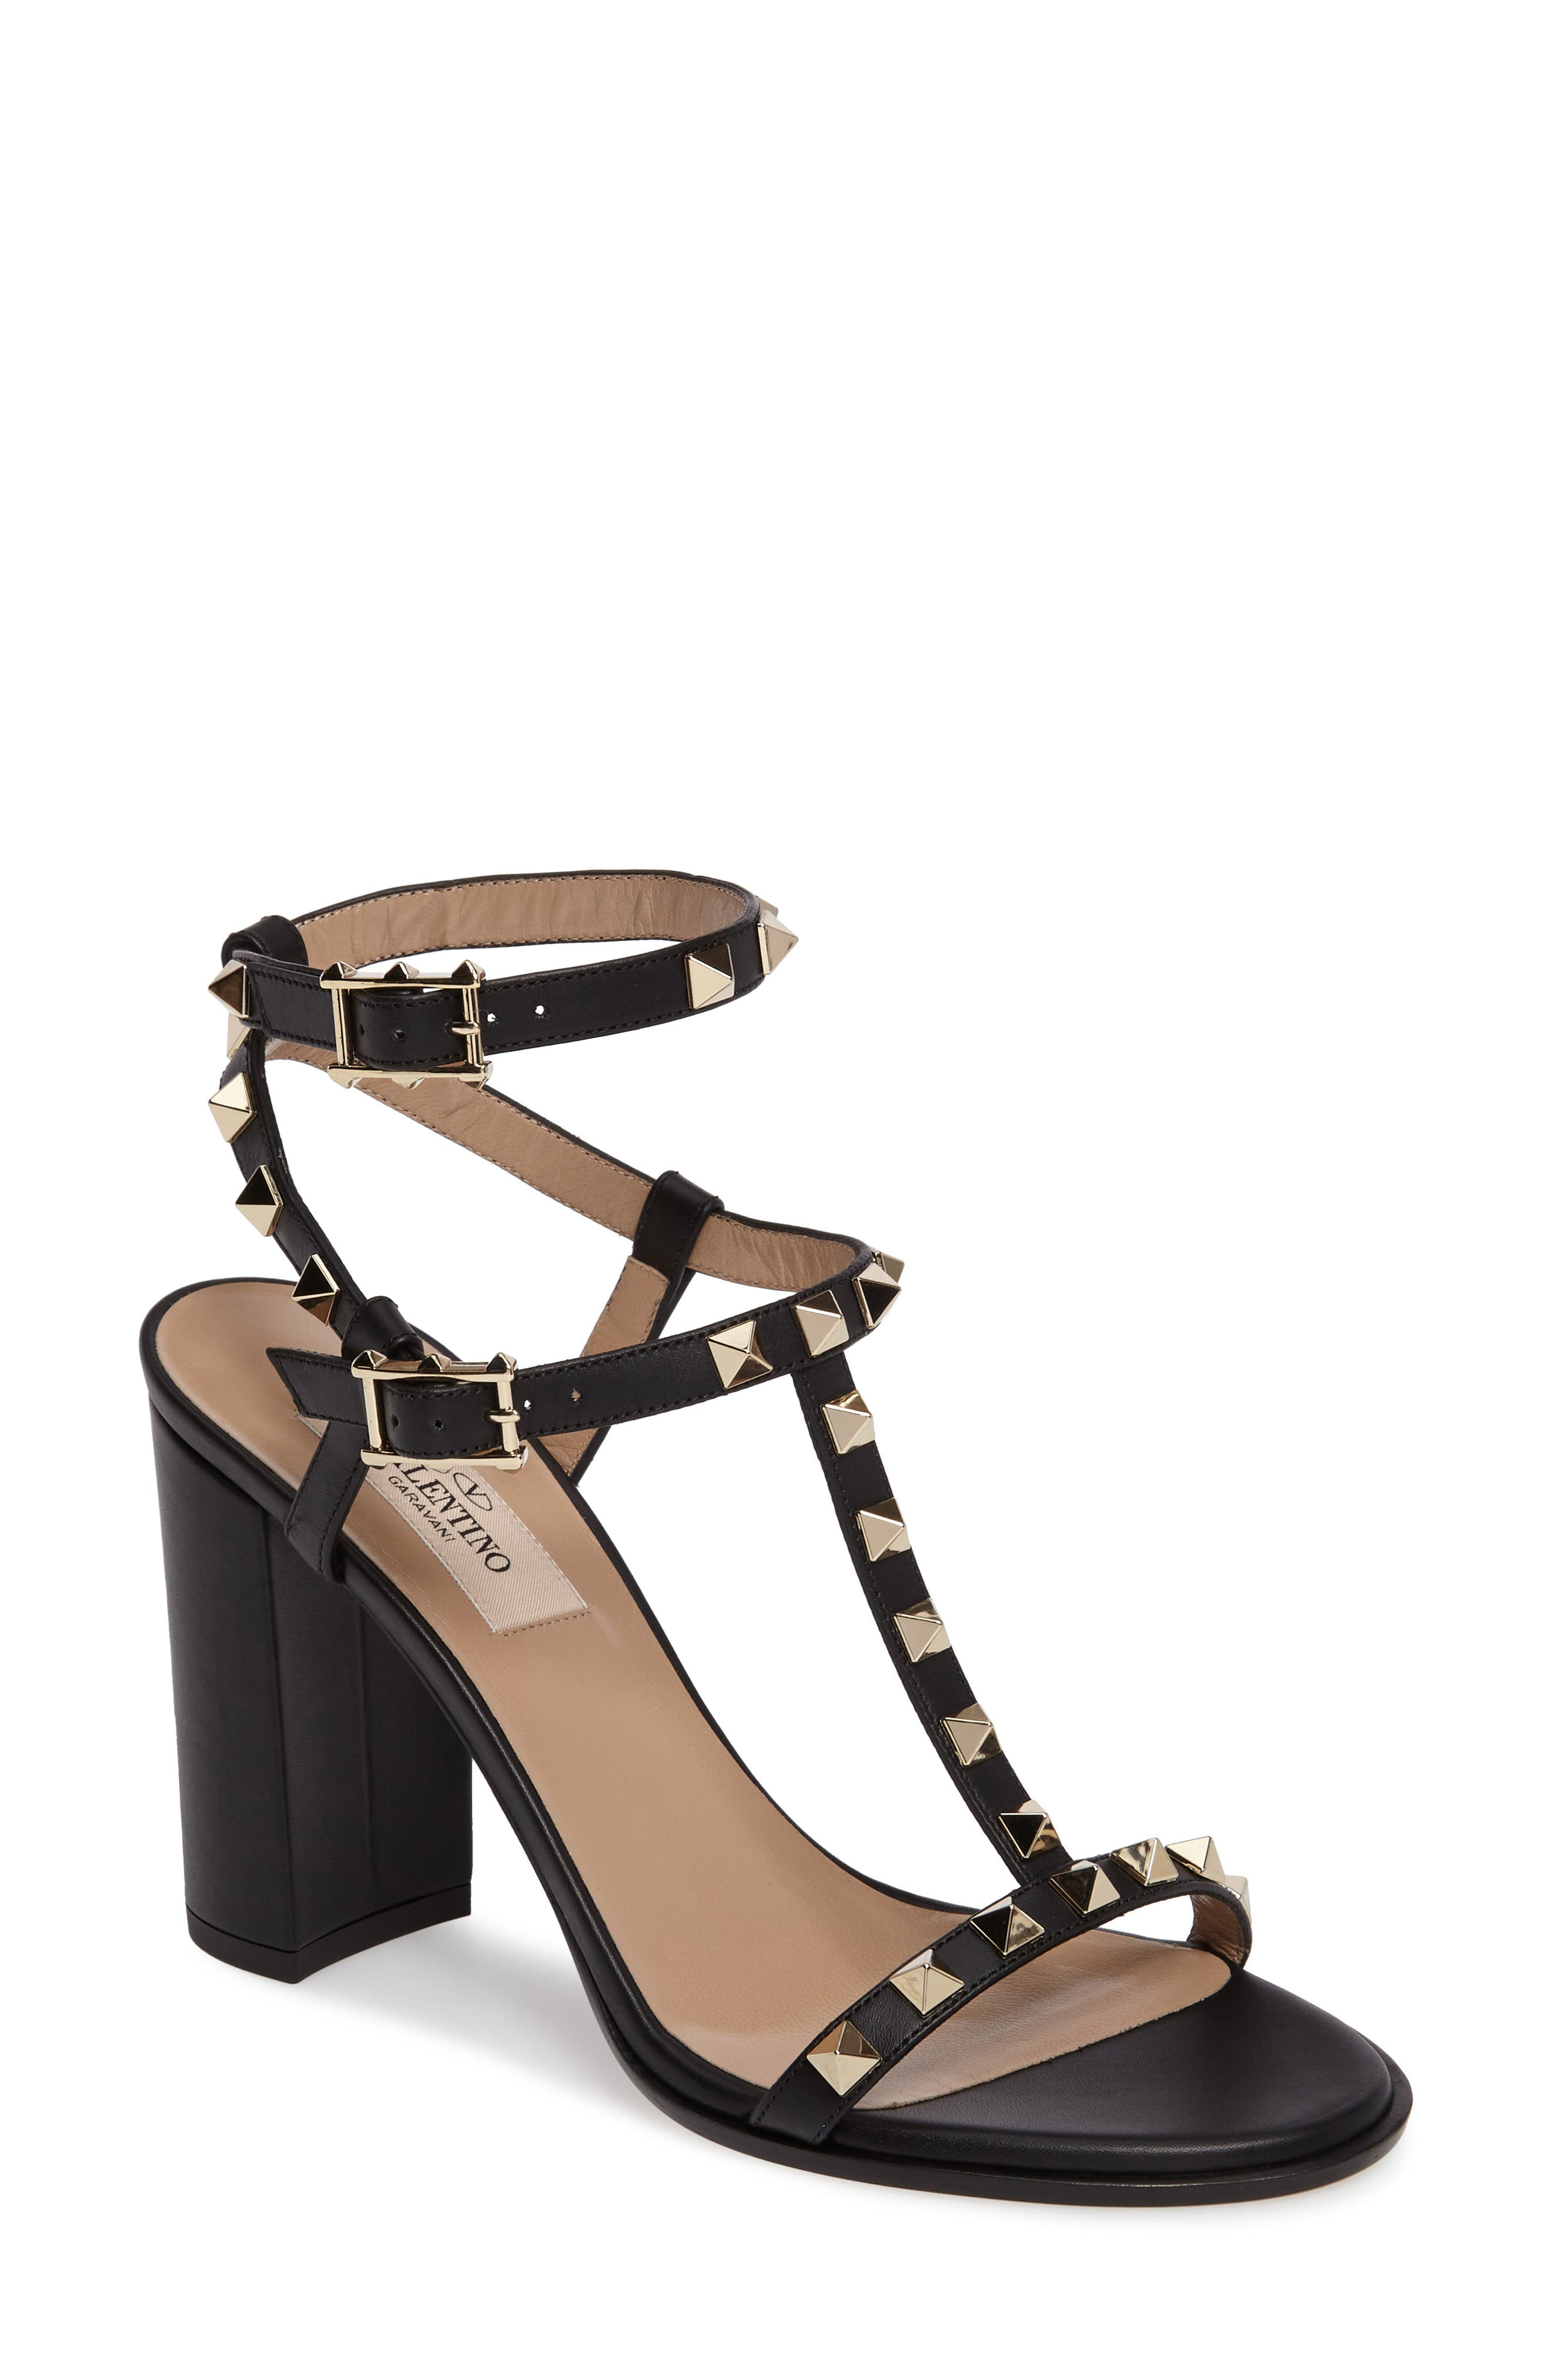 Main Image - Valentino Rockstud Ankle Strap Sandal (Women)